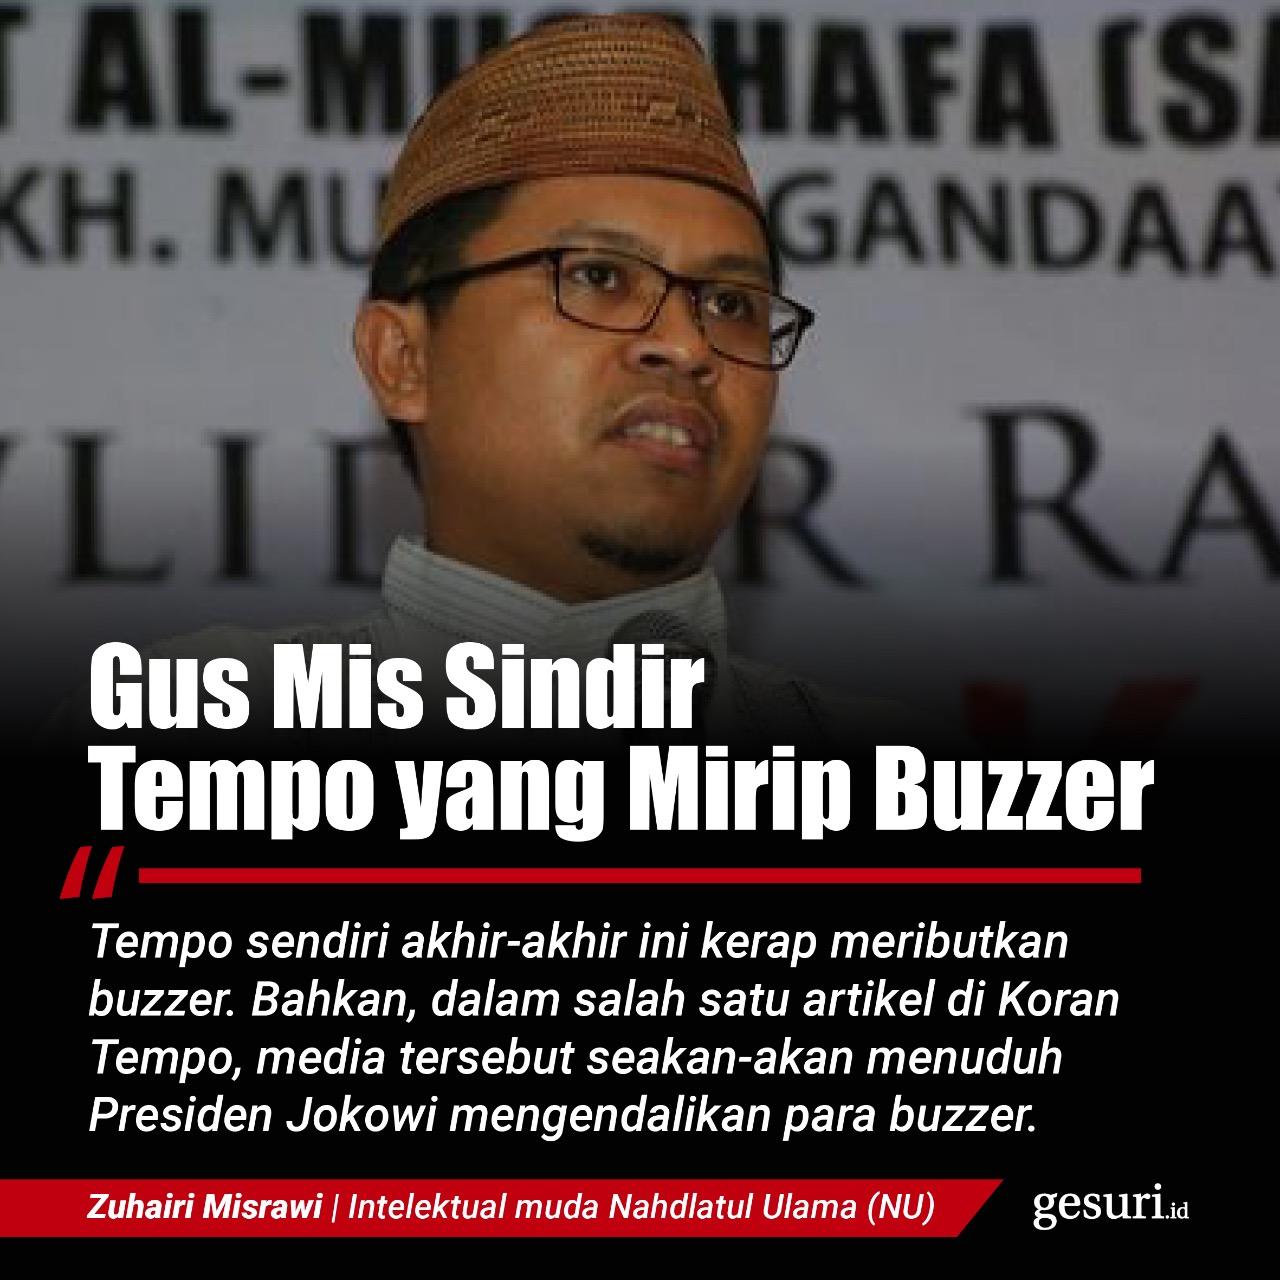 Zuhairi Misrawi Sindir Media Tempo yang Mirip Buzzer